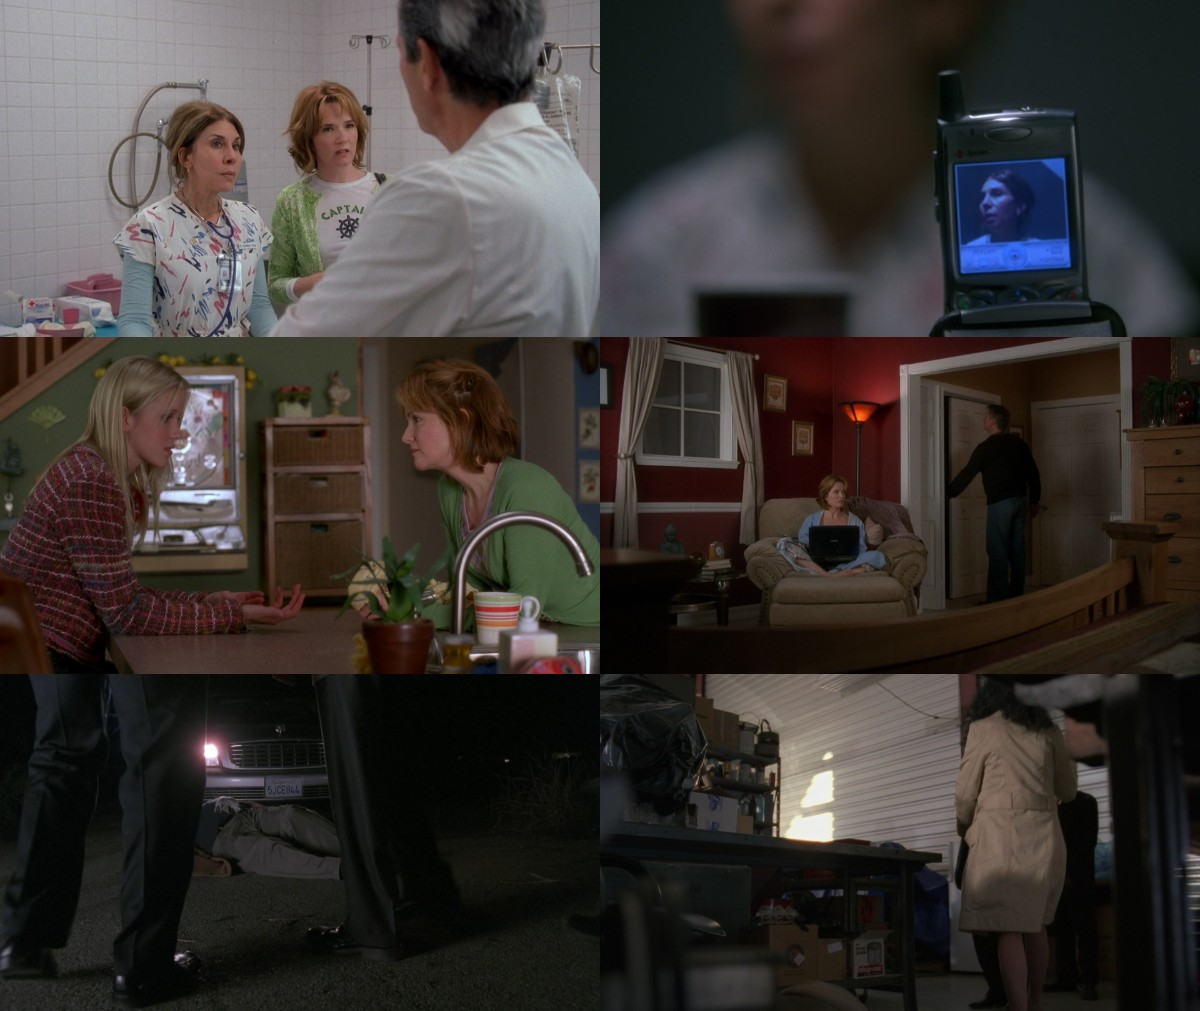 Jane Doe Til Death Do Us Part 2005 1080p WEBRip x265-RARBG